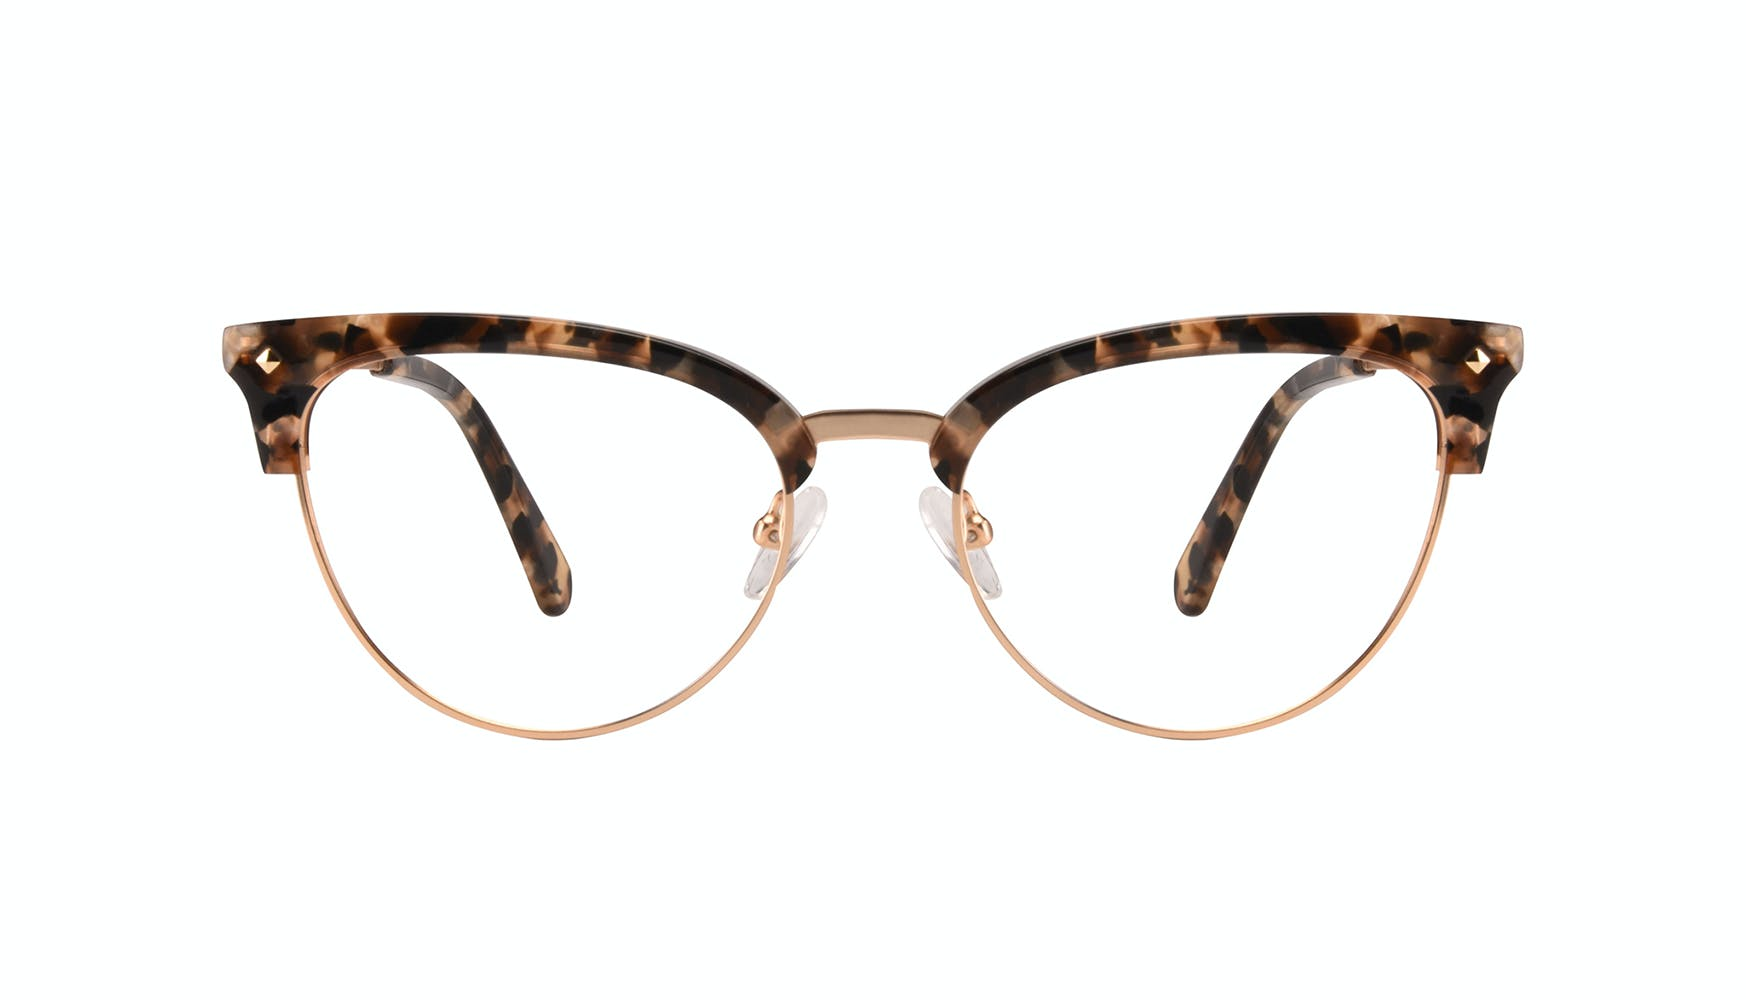 Affordable Fashion Glasses Cat Eye Daring Cateye Eyeglasses Women Moon Gold Flake Front